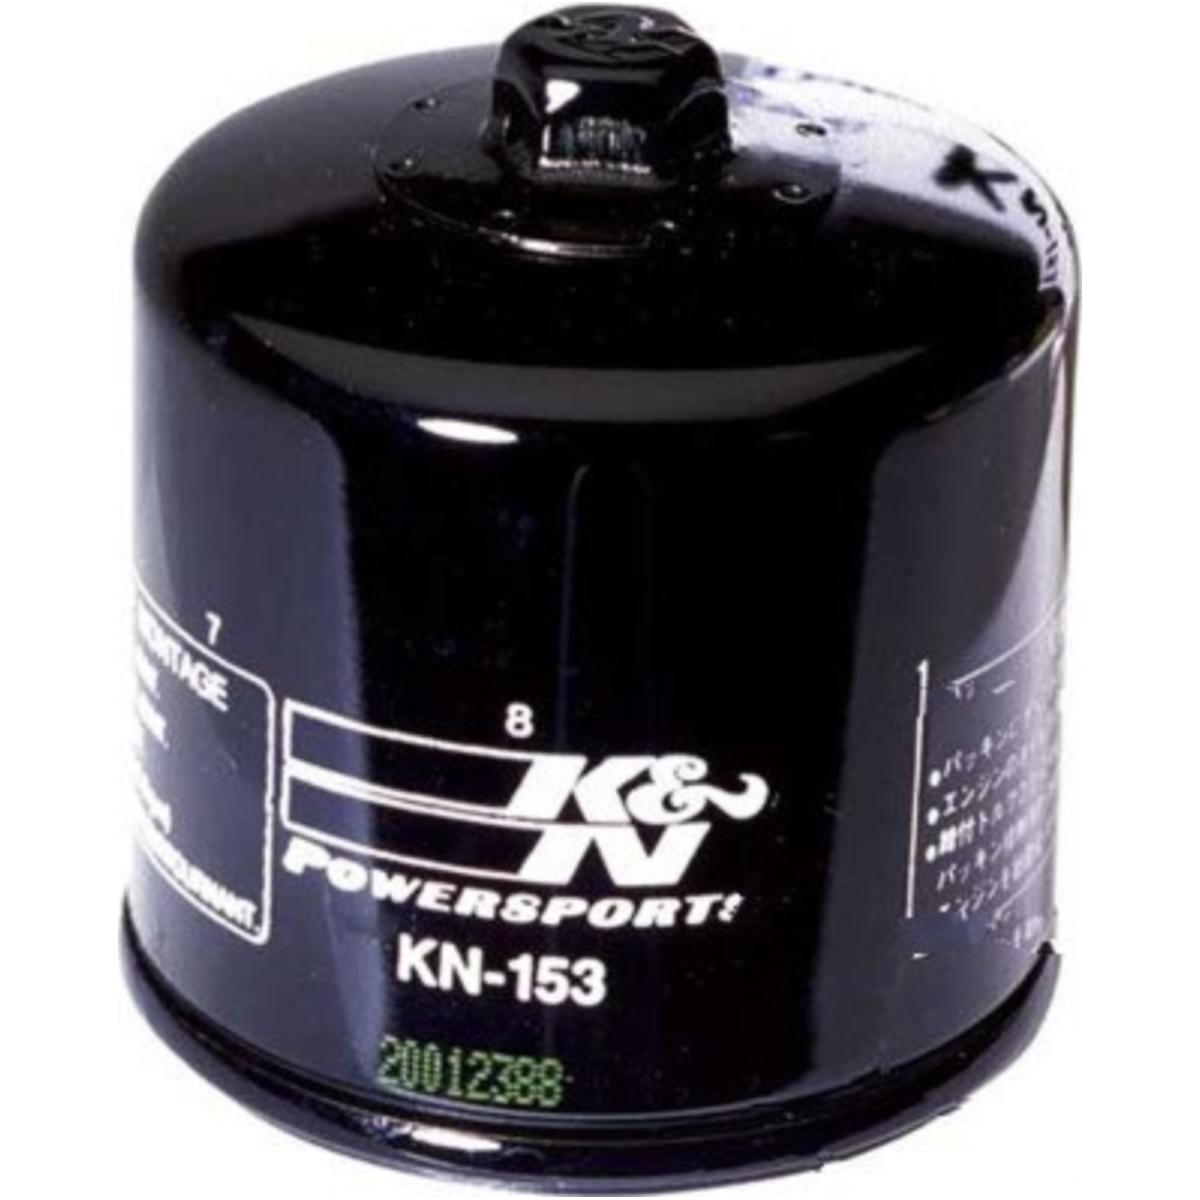 Kn 153 Premium Oil Filter Ducati Diavel Carbon Abs 80391 Fuse Box